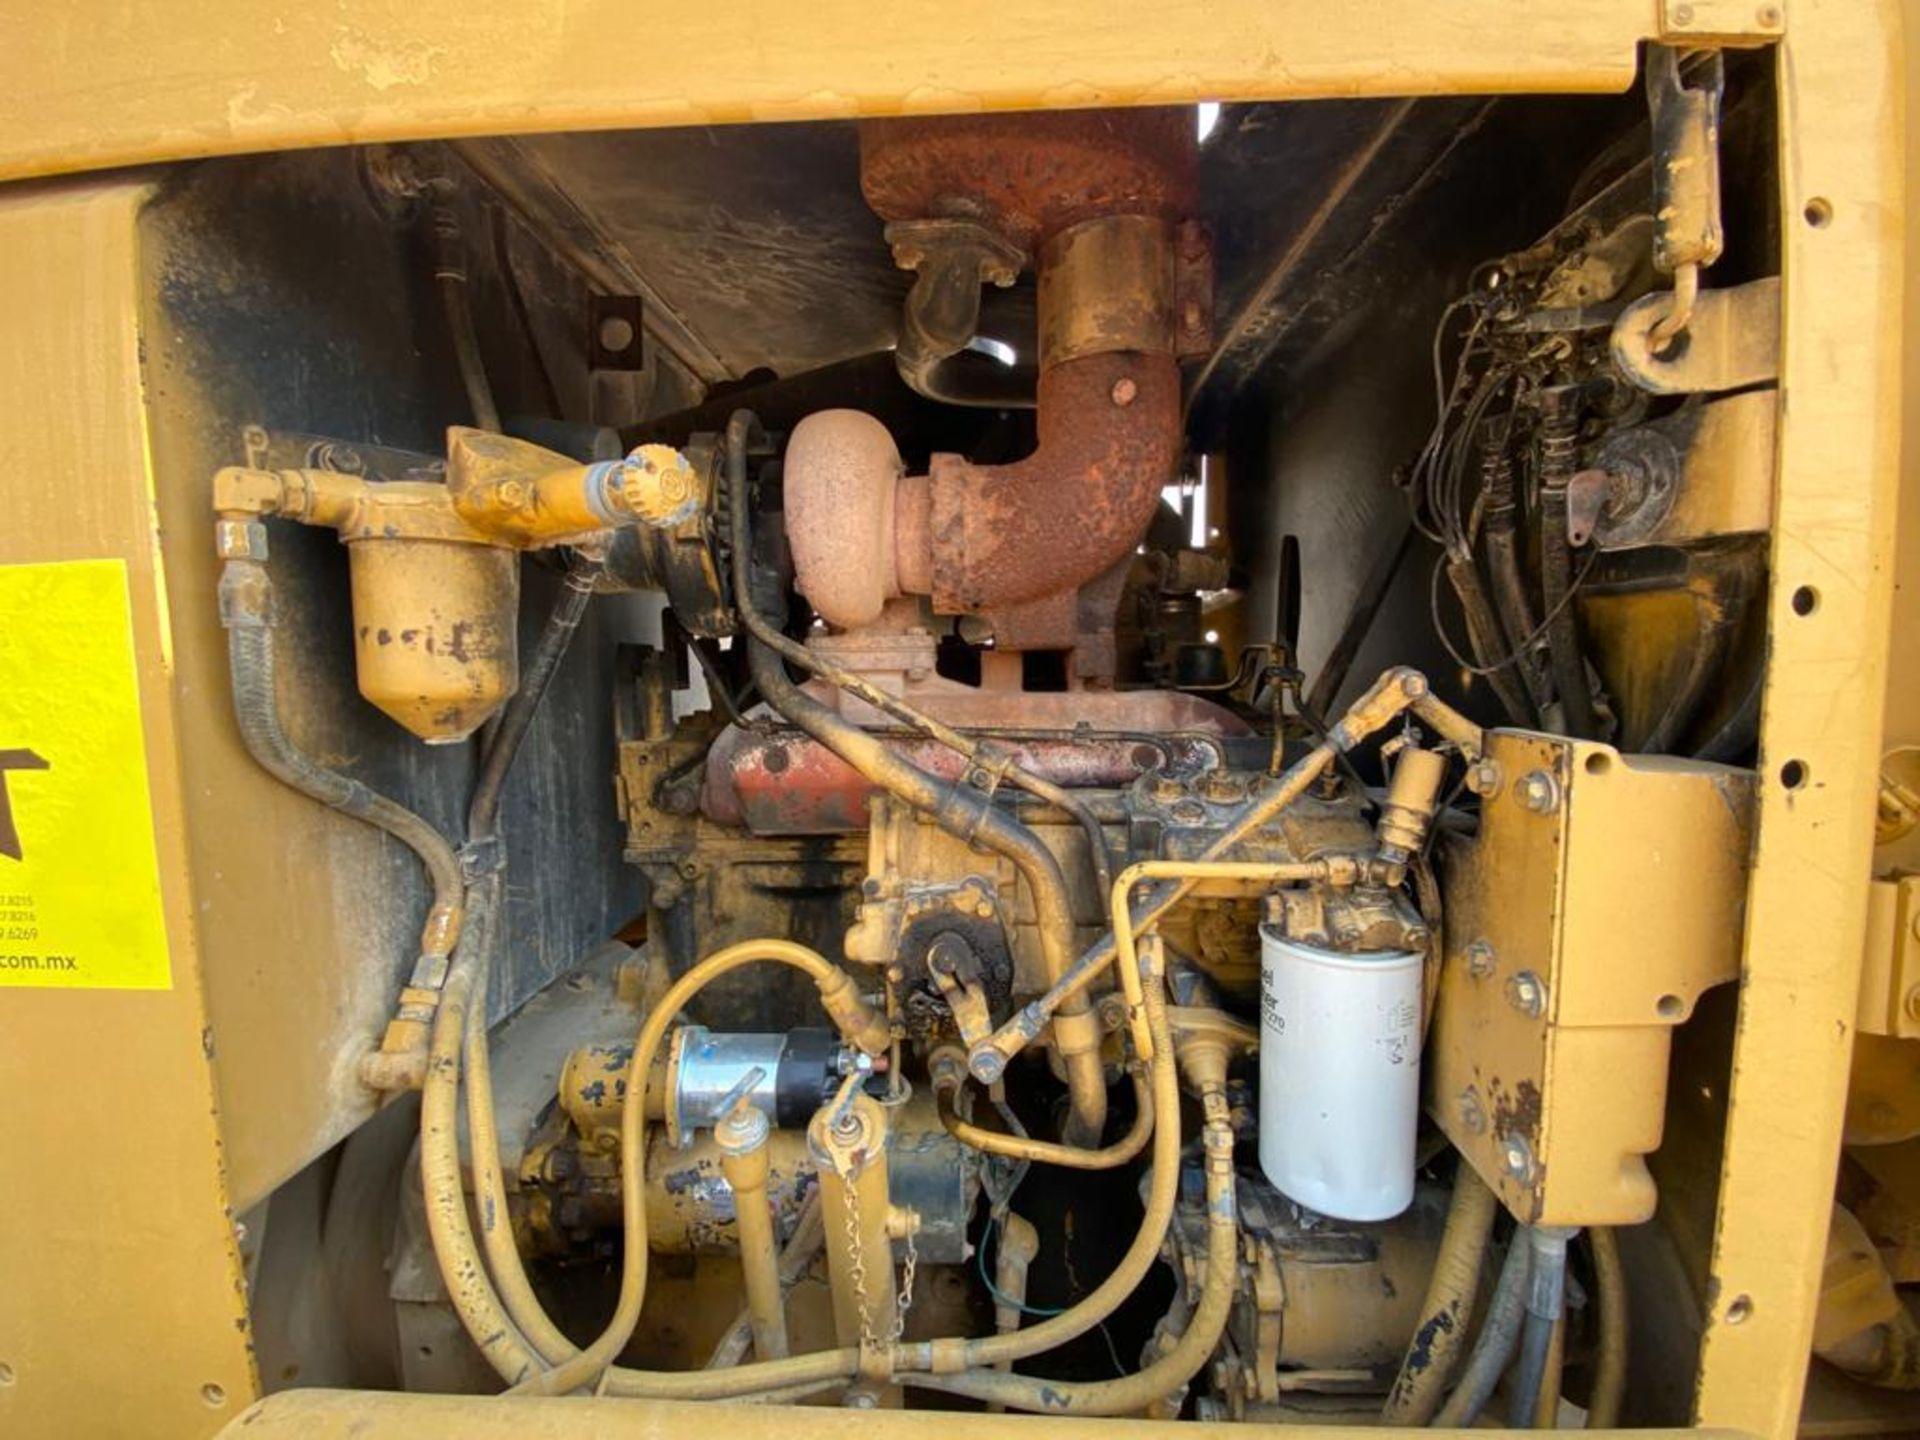 Caterpillar 120G Motor Grader, Serial number 87V09646, Motor number PQ883-2/07Z28983 - Image 52 of 61